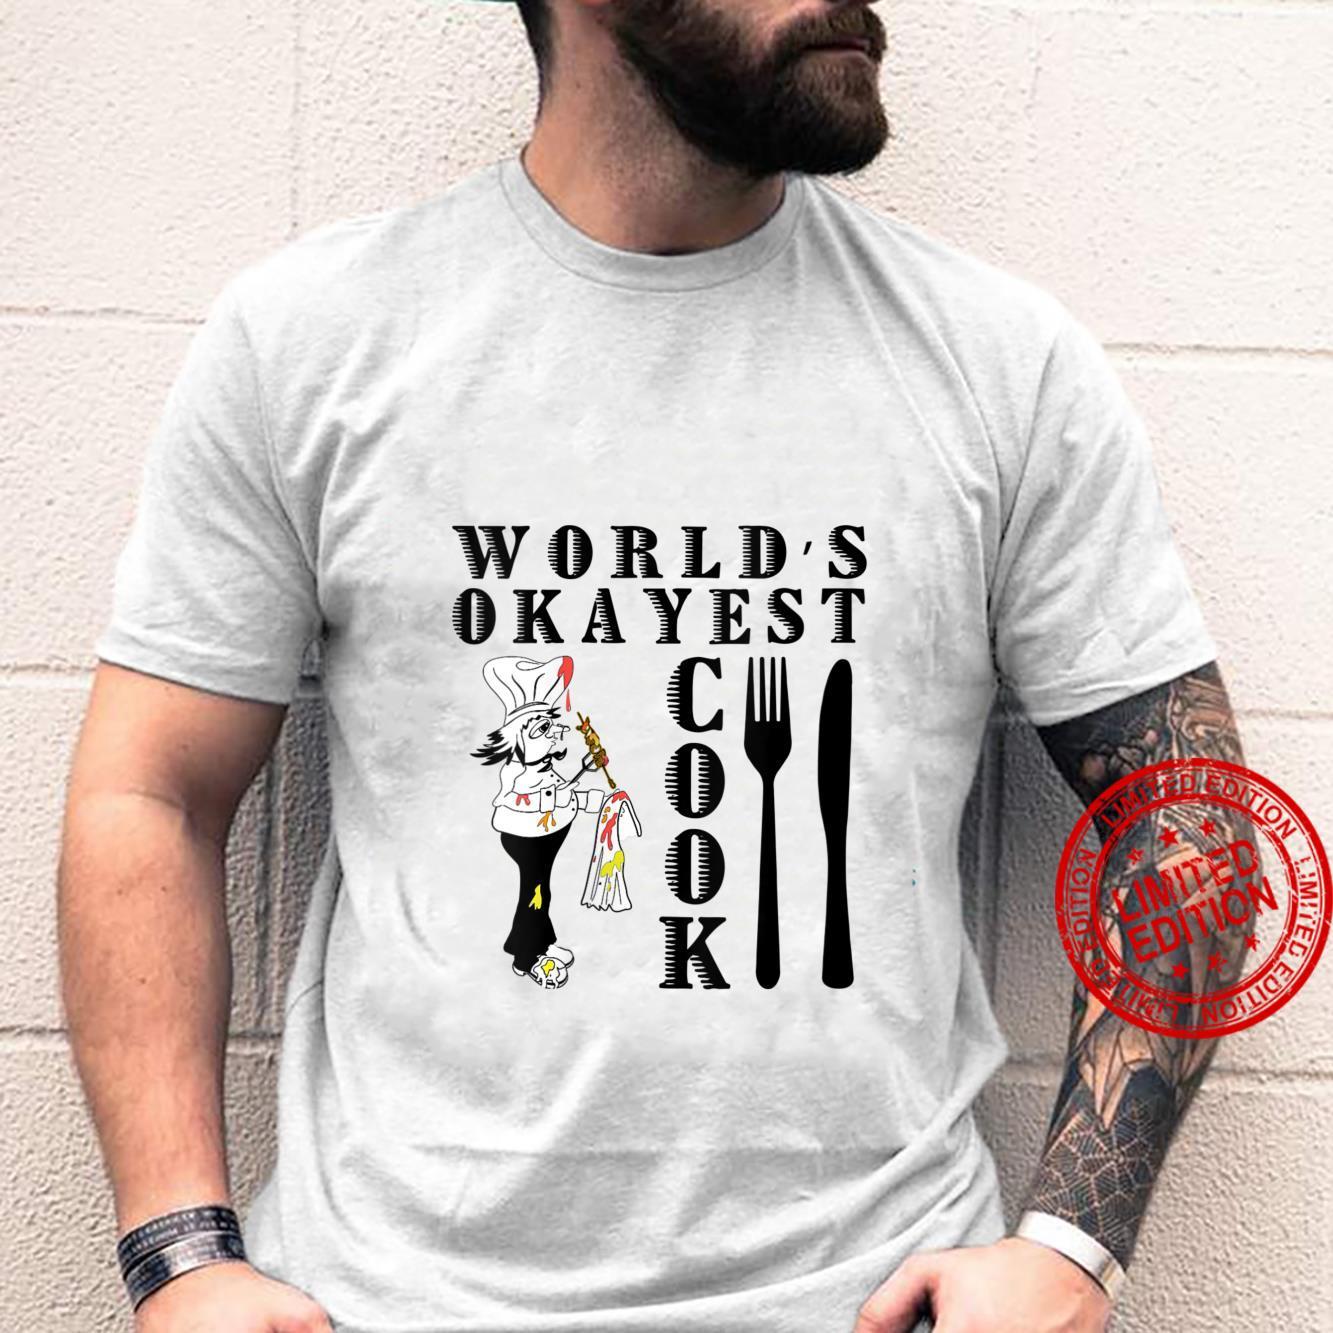 Womens World's Okayest Cook Shirt